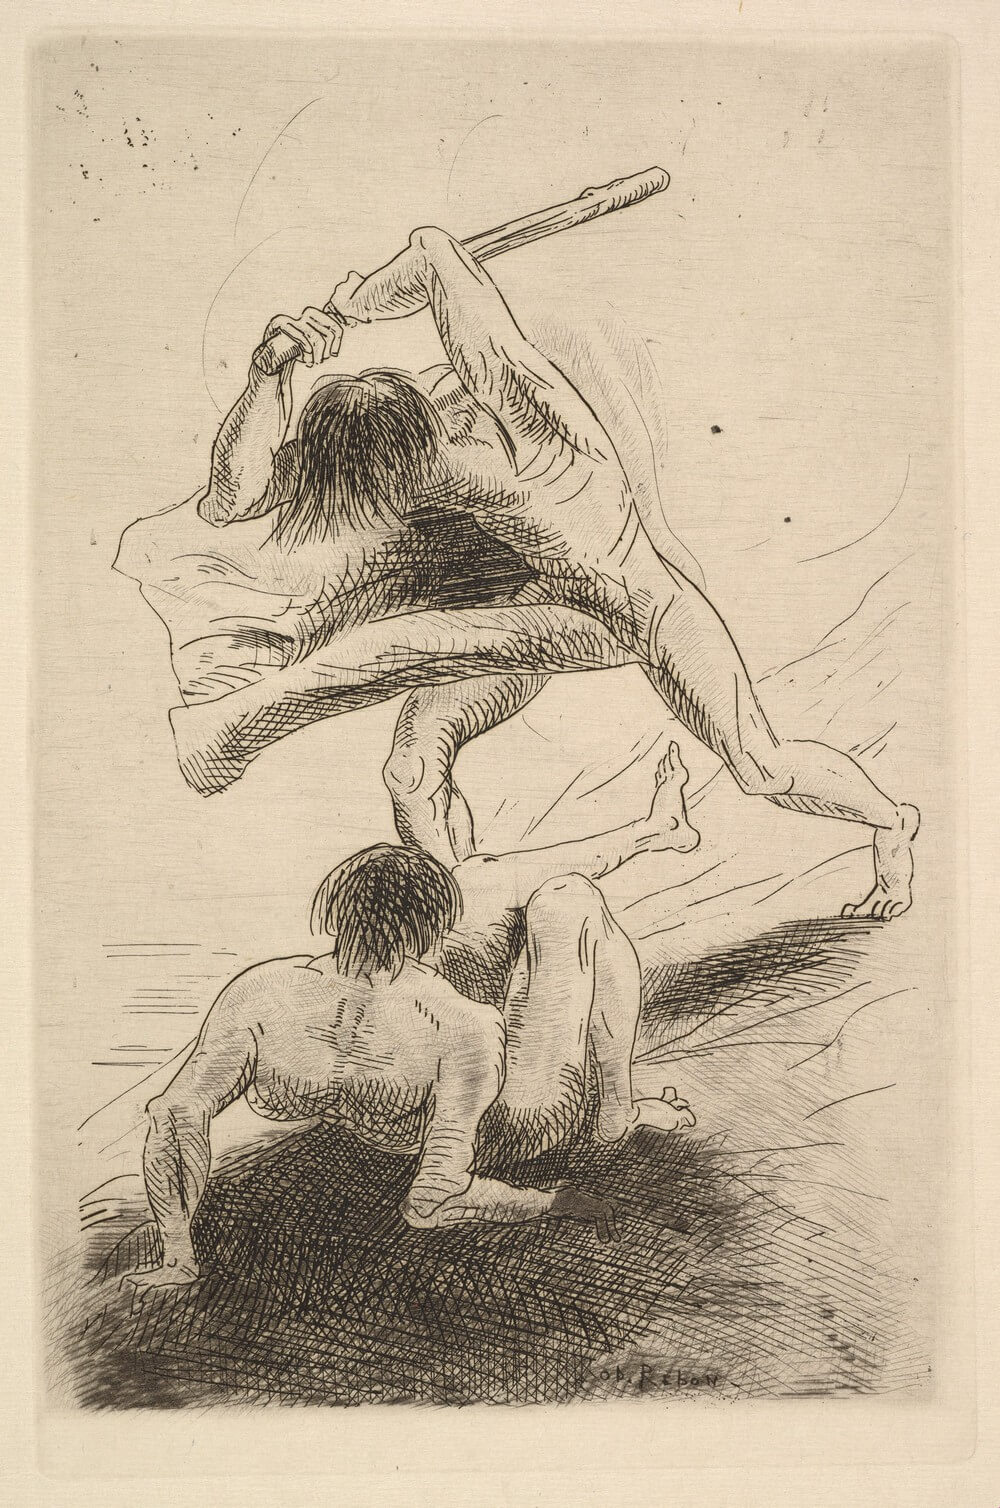 Odilon Redon. Abel et Caïn. 1886. Baudelaire. Madame Aupick. Vertalingen Vivienne Stringa